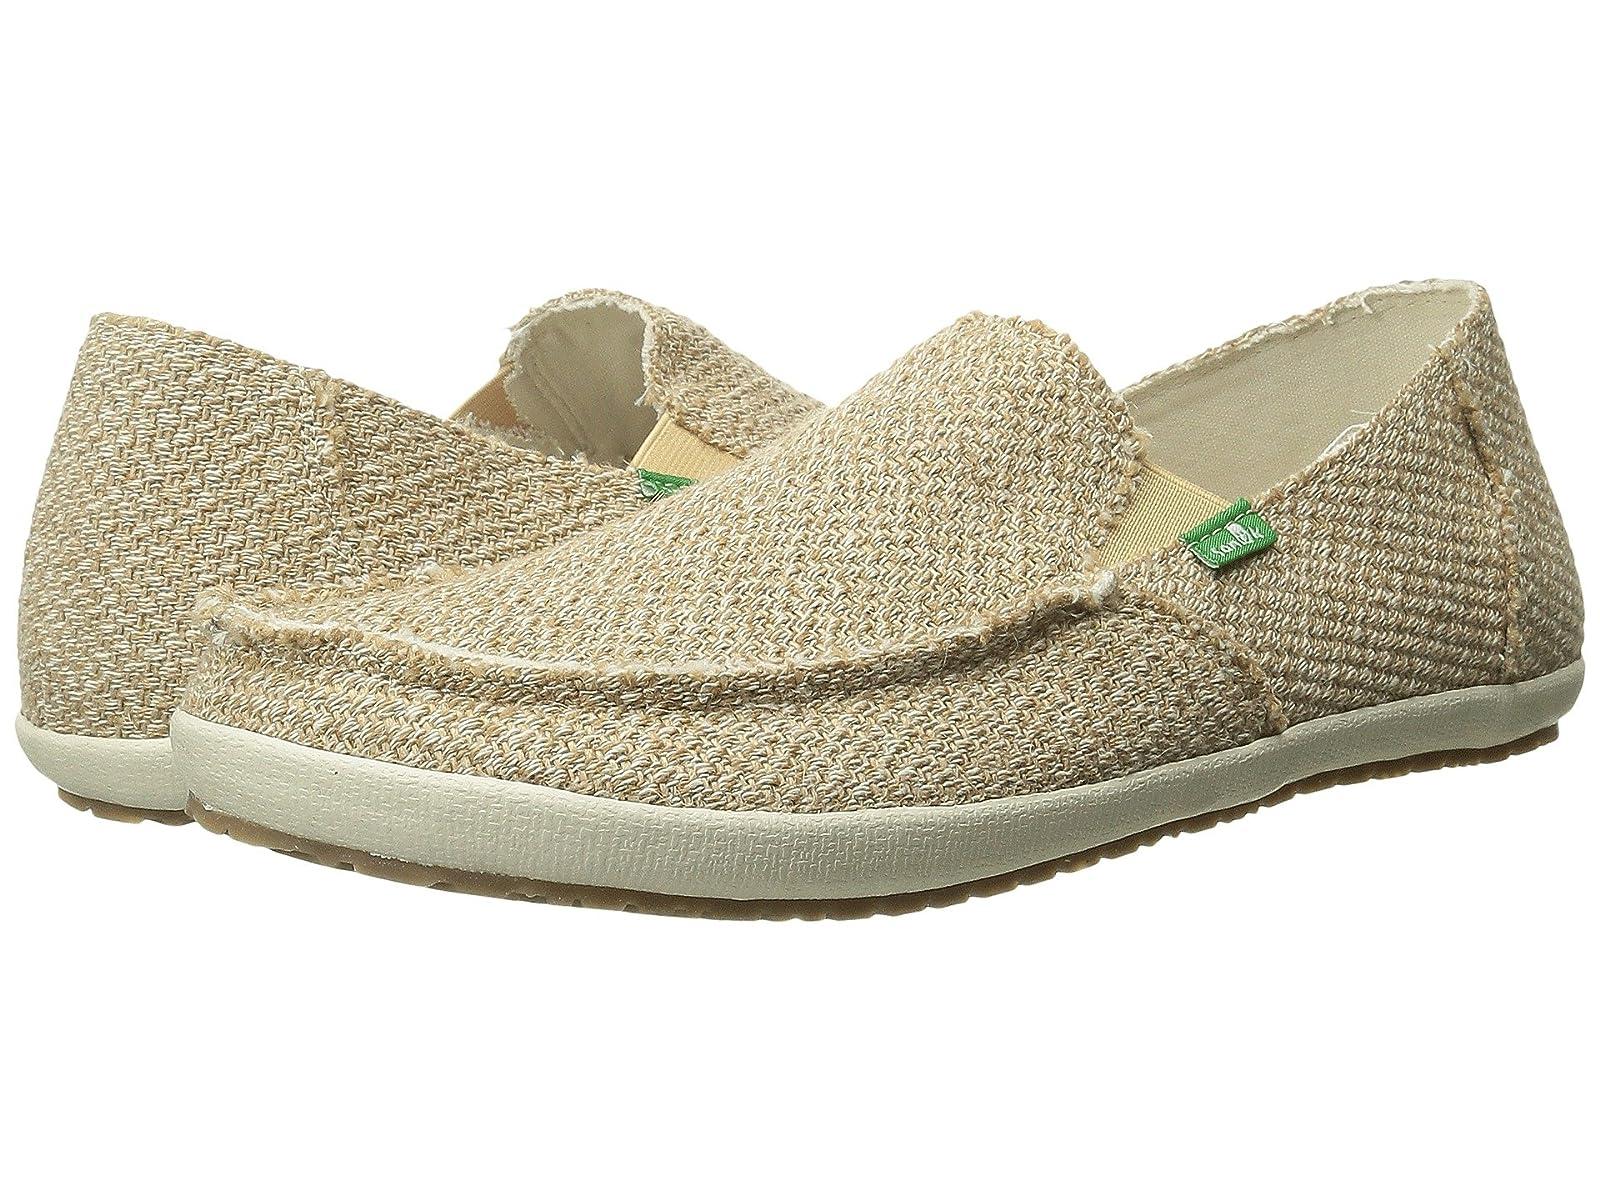 Sanuk Rounder Hobo HempCheap and distinctive eye-catching shoes